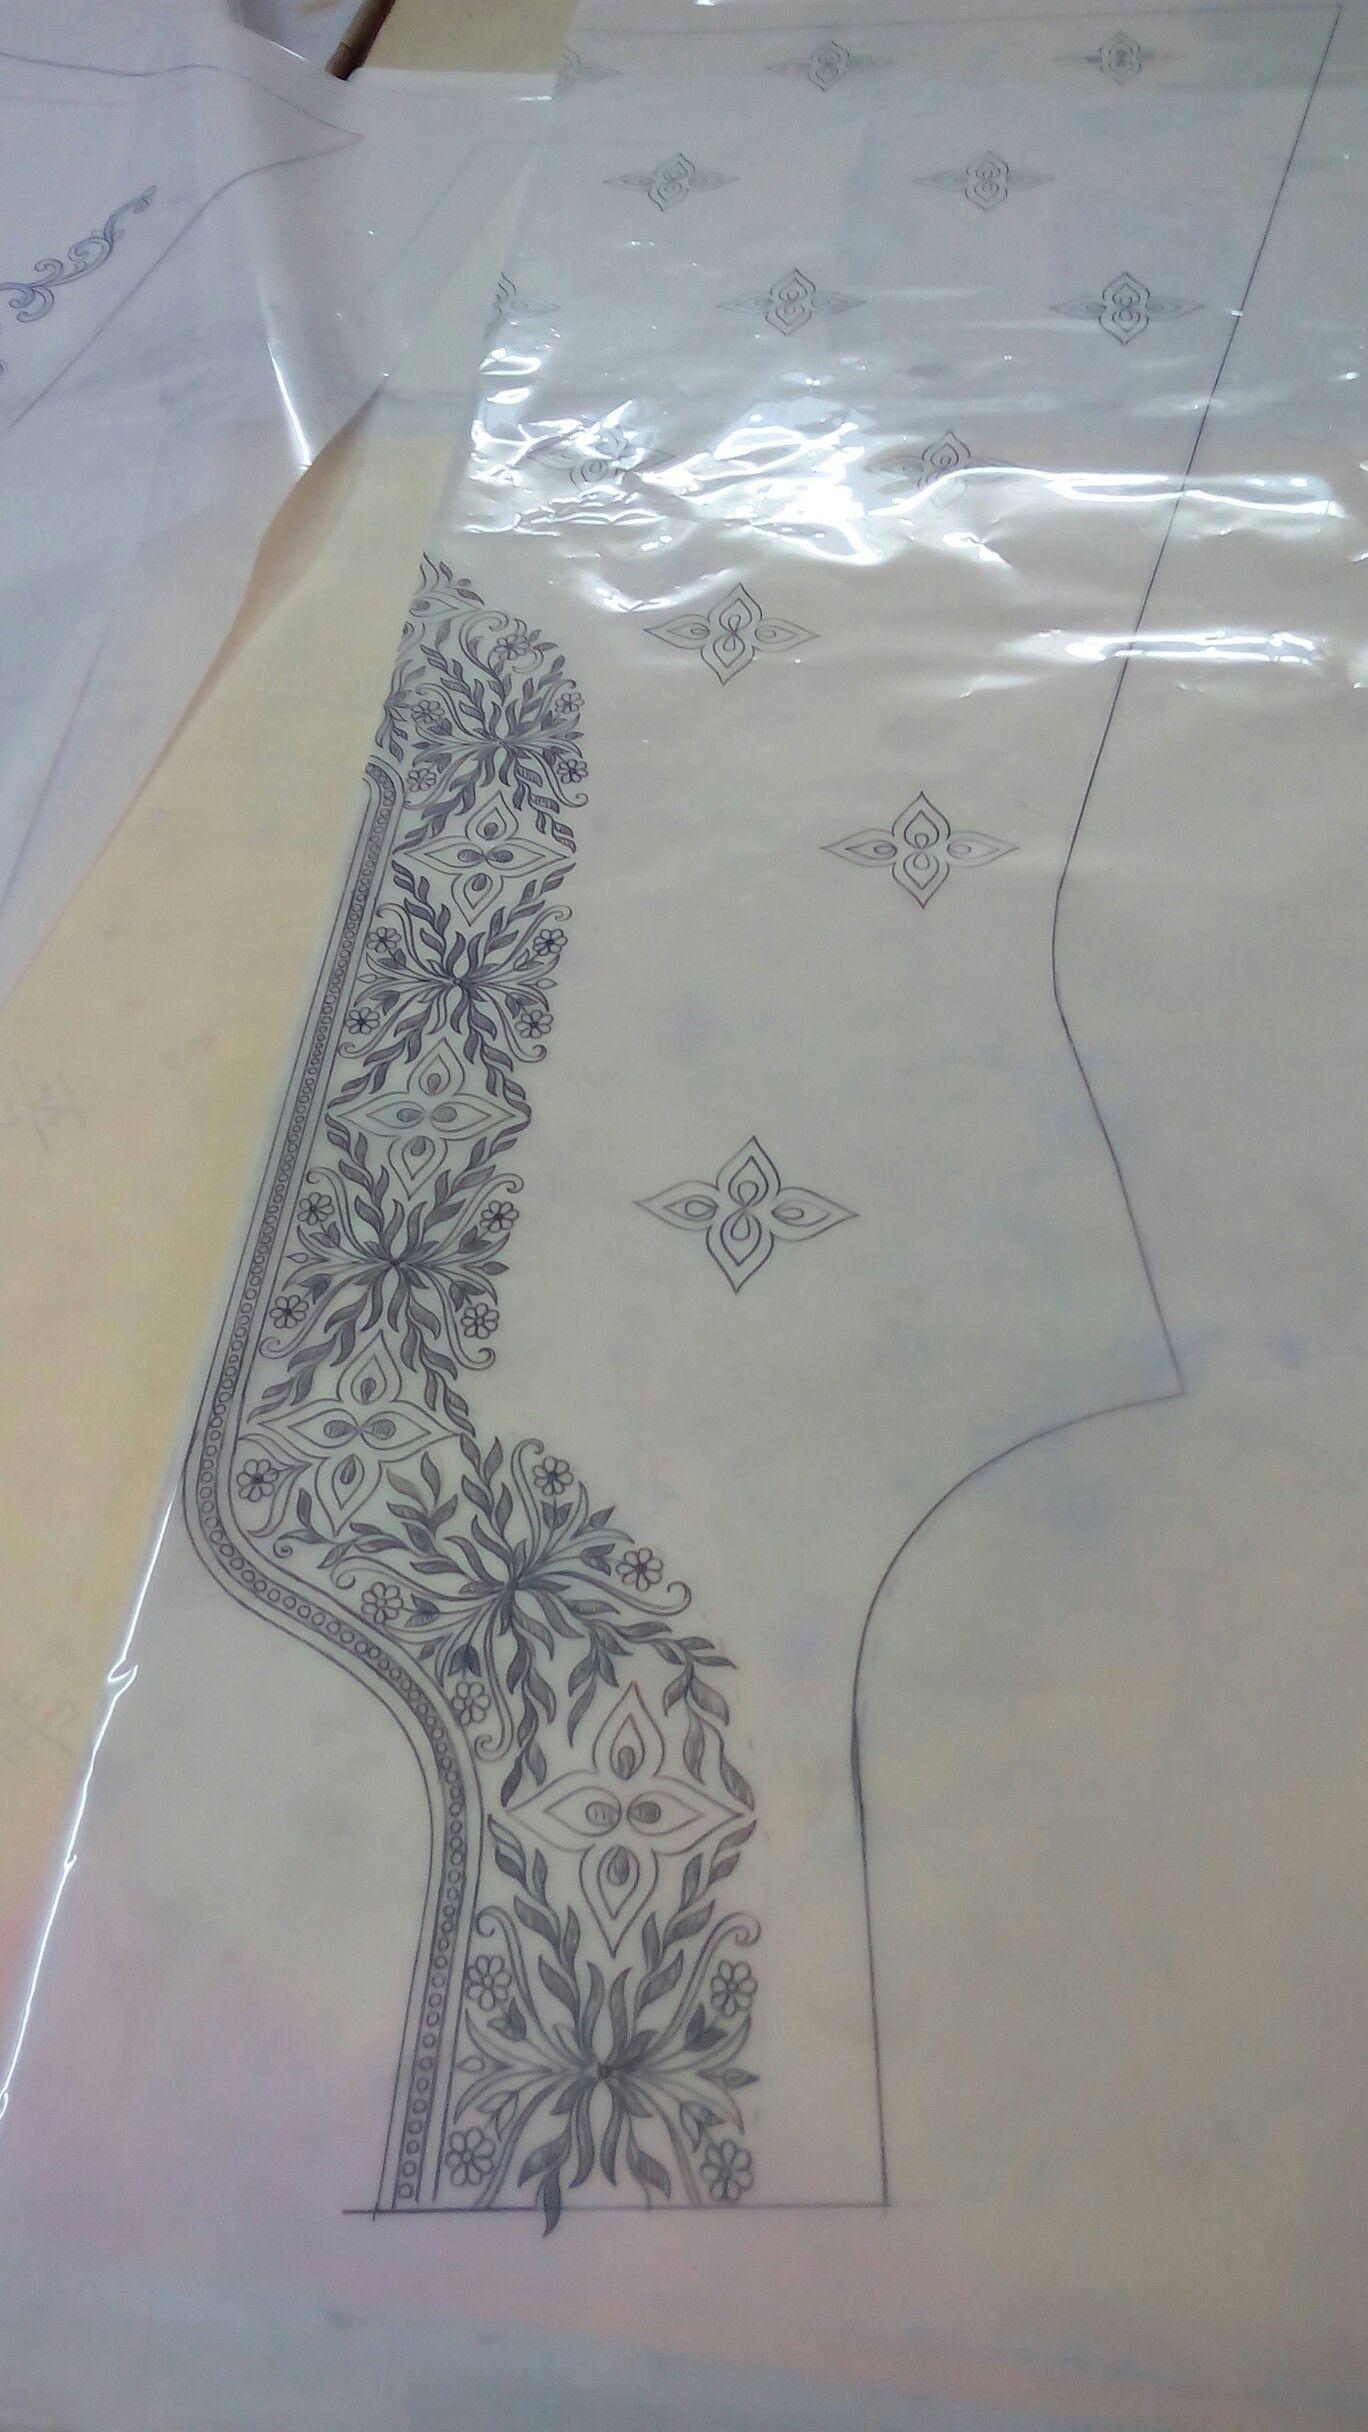 Pin de sk manir en MANIRUL 9819220542   Pinterest   Dibujos de ...